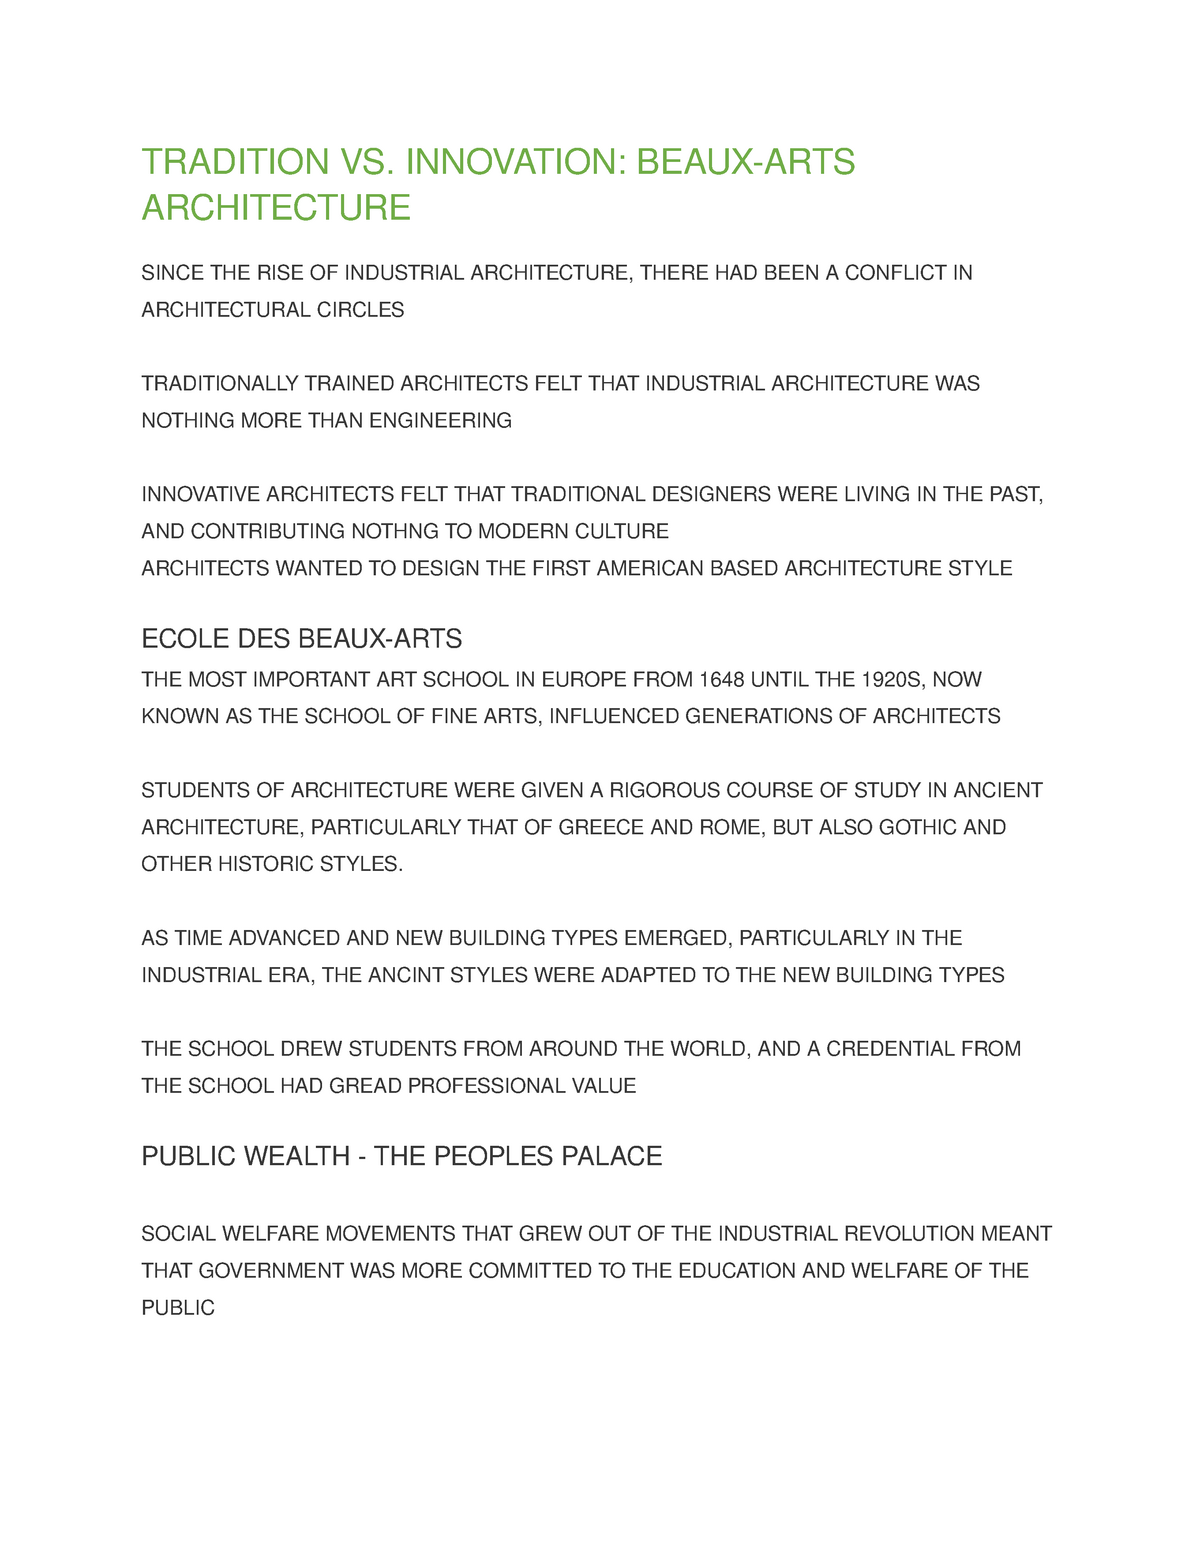 ARCH 245 - Beaux-ARTS Architecture - ARCH 245: Architectural